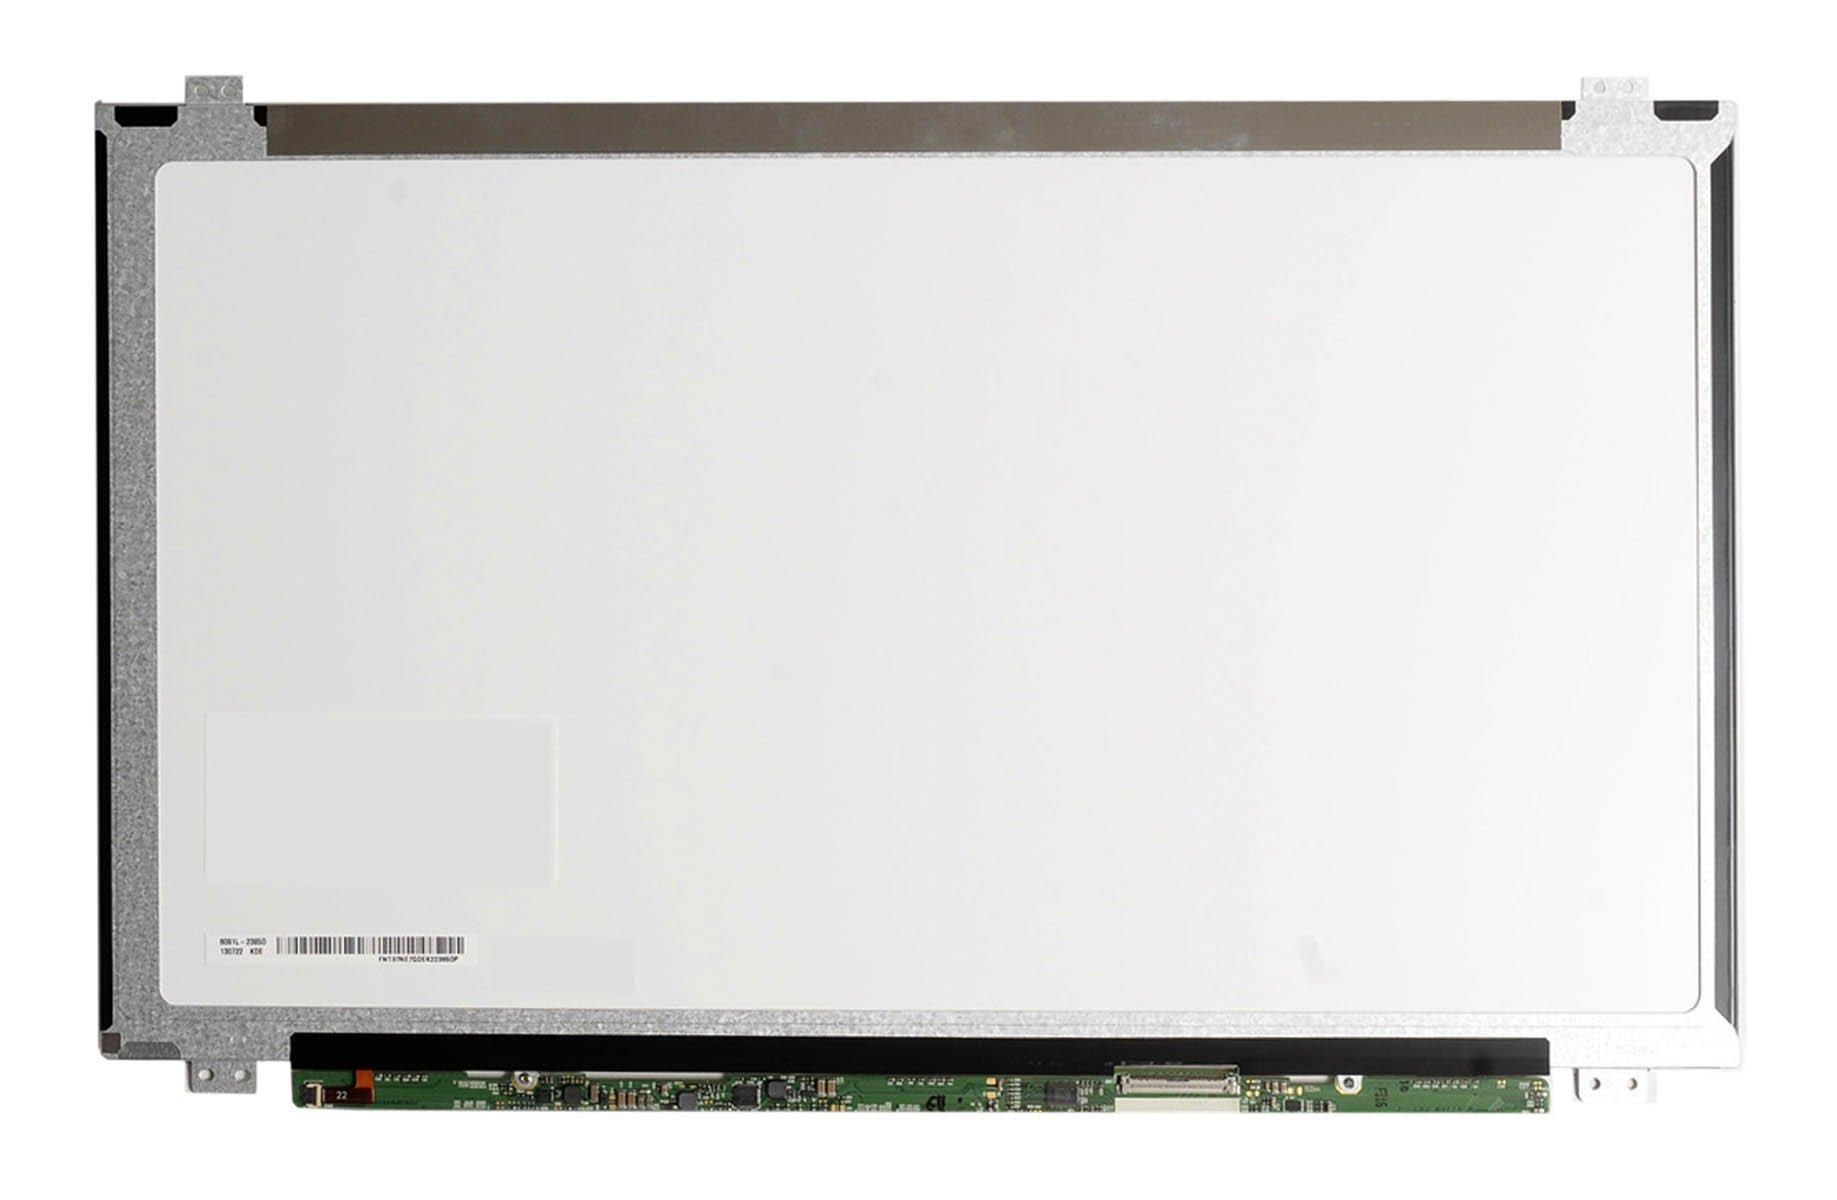 HP-Compaq ENVY 15T-J000 CTO HD SLIM LED LCD 15.6'' SLIM LCD LED Display Screen